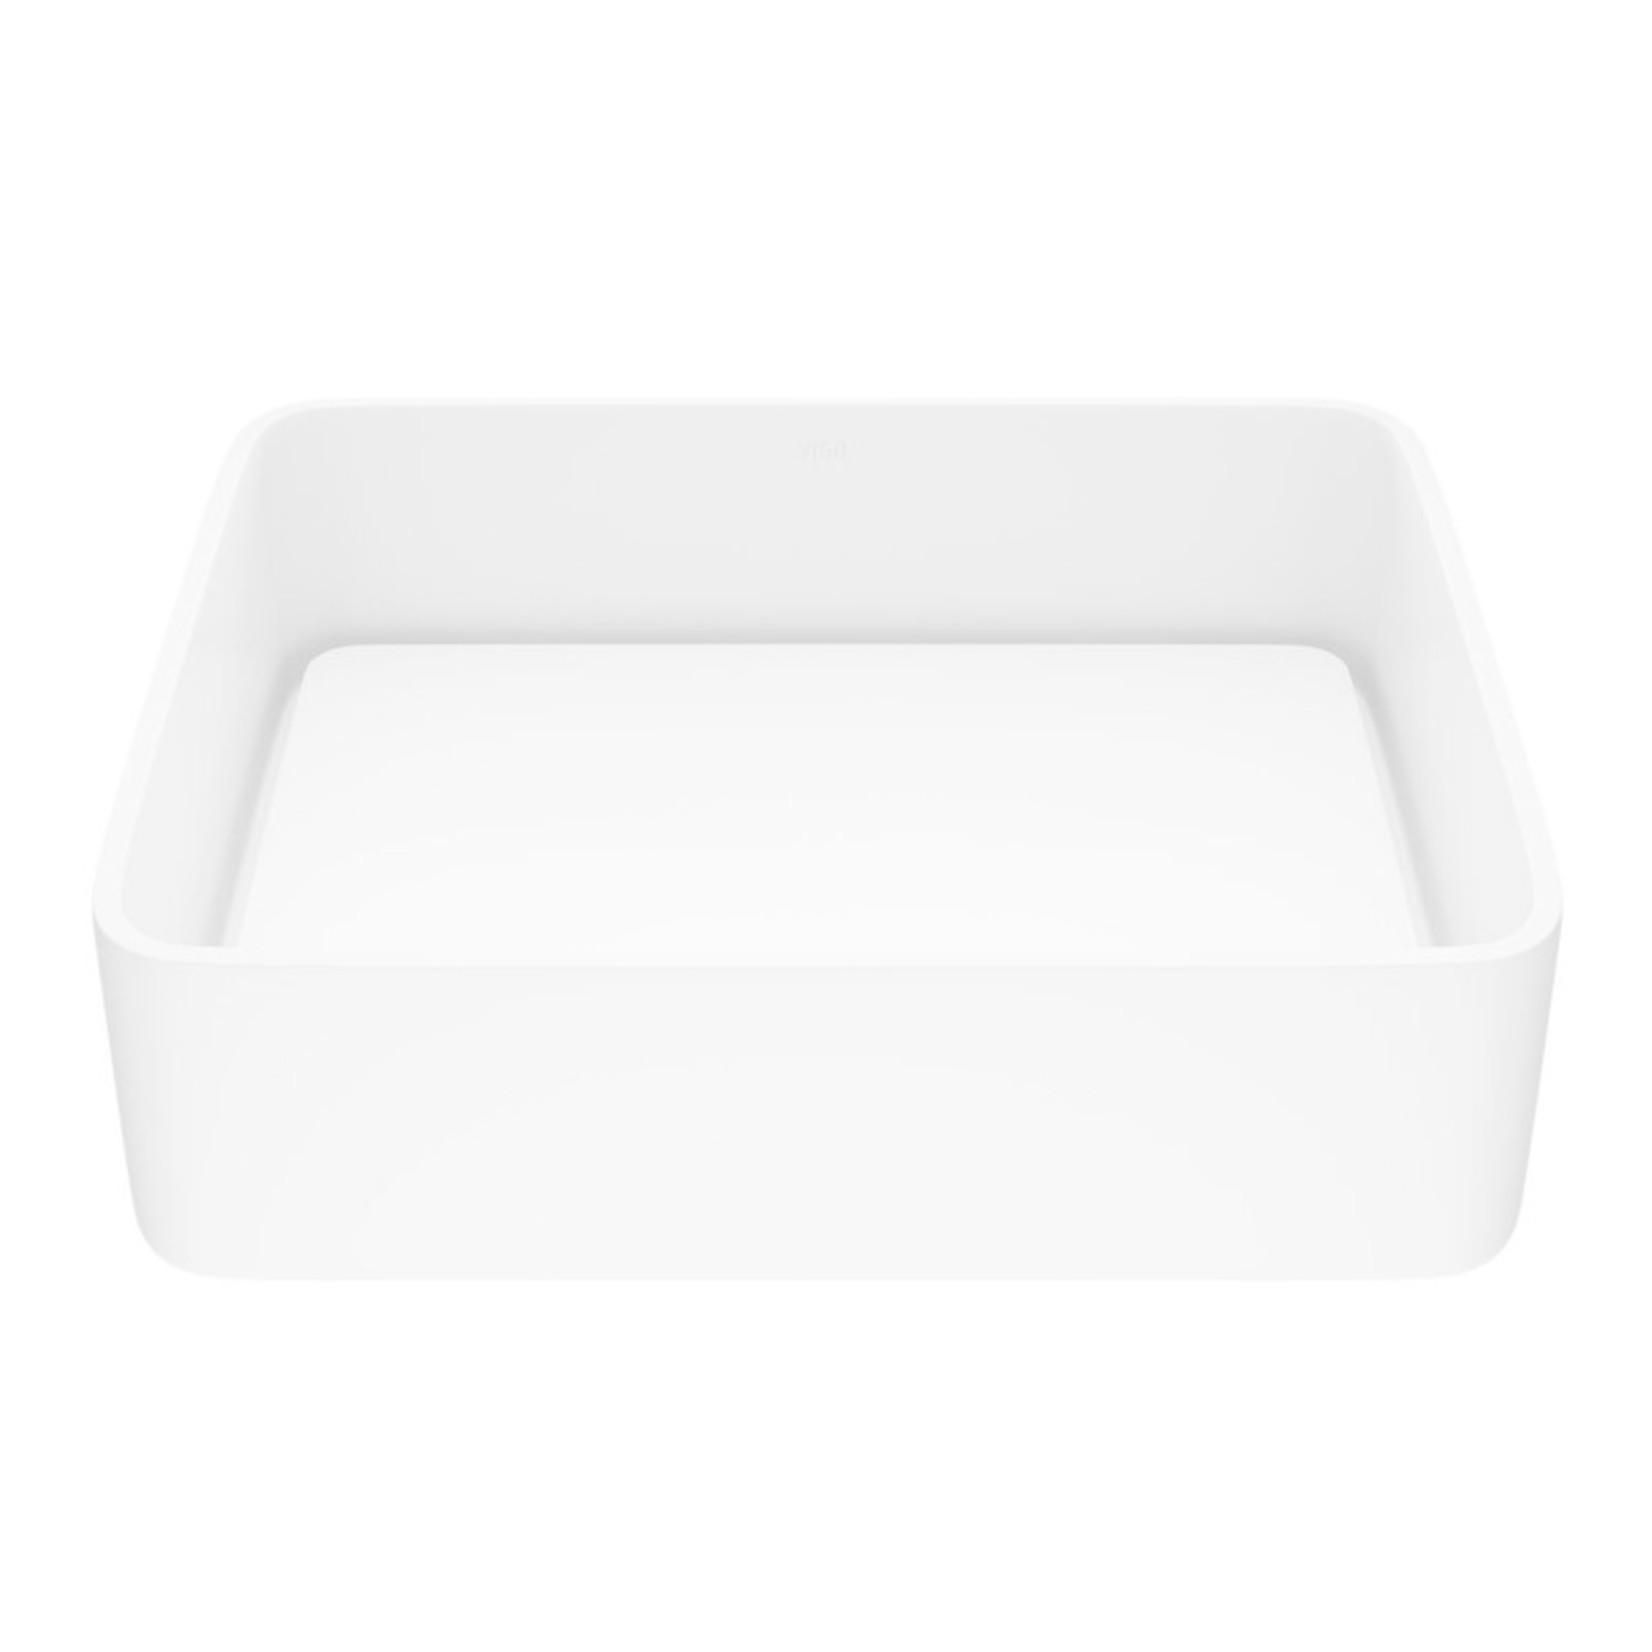 *Vigo Matte Stone White Rectangular Vessel Bathroom Sink with Faucet & Drain